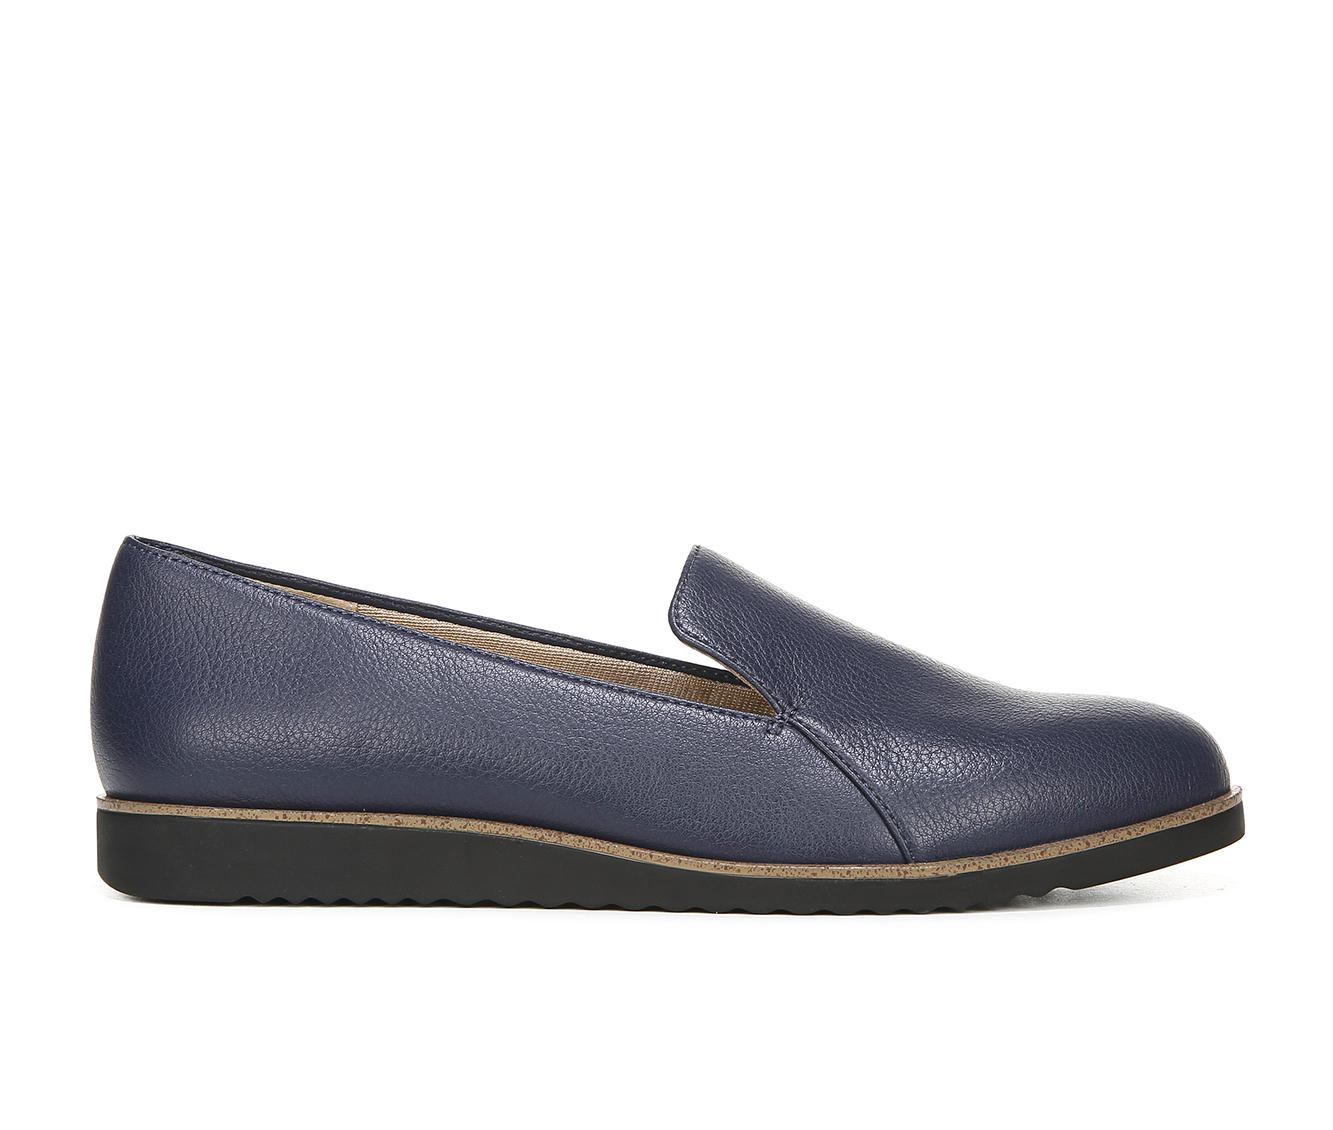 LifeStride Zendaya Women's Shoe (Blue Faux Leather)